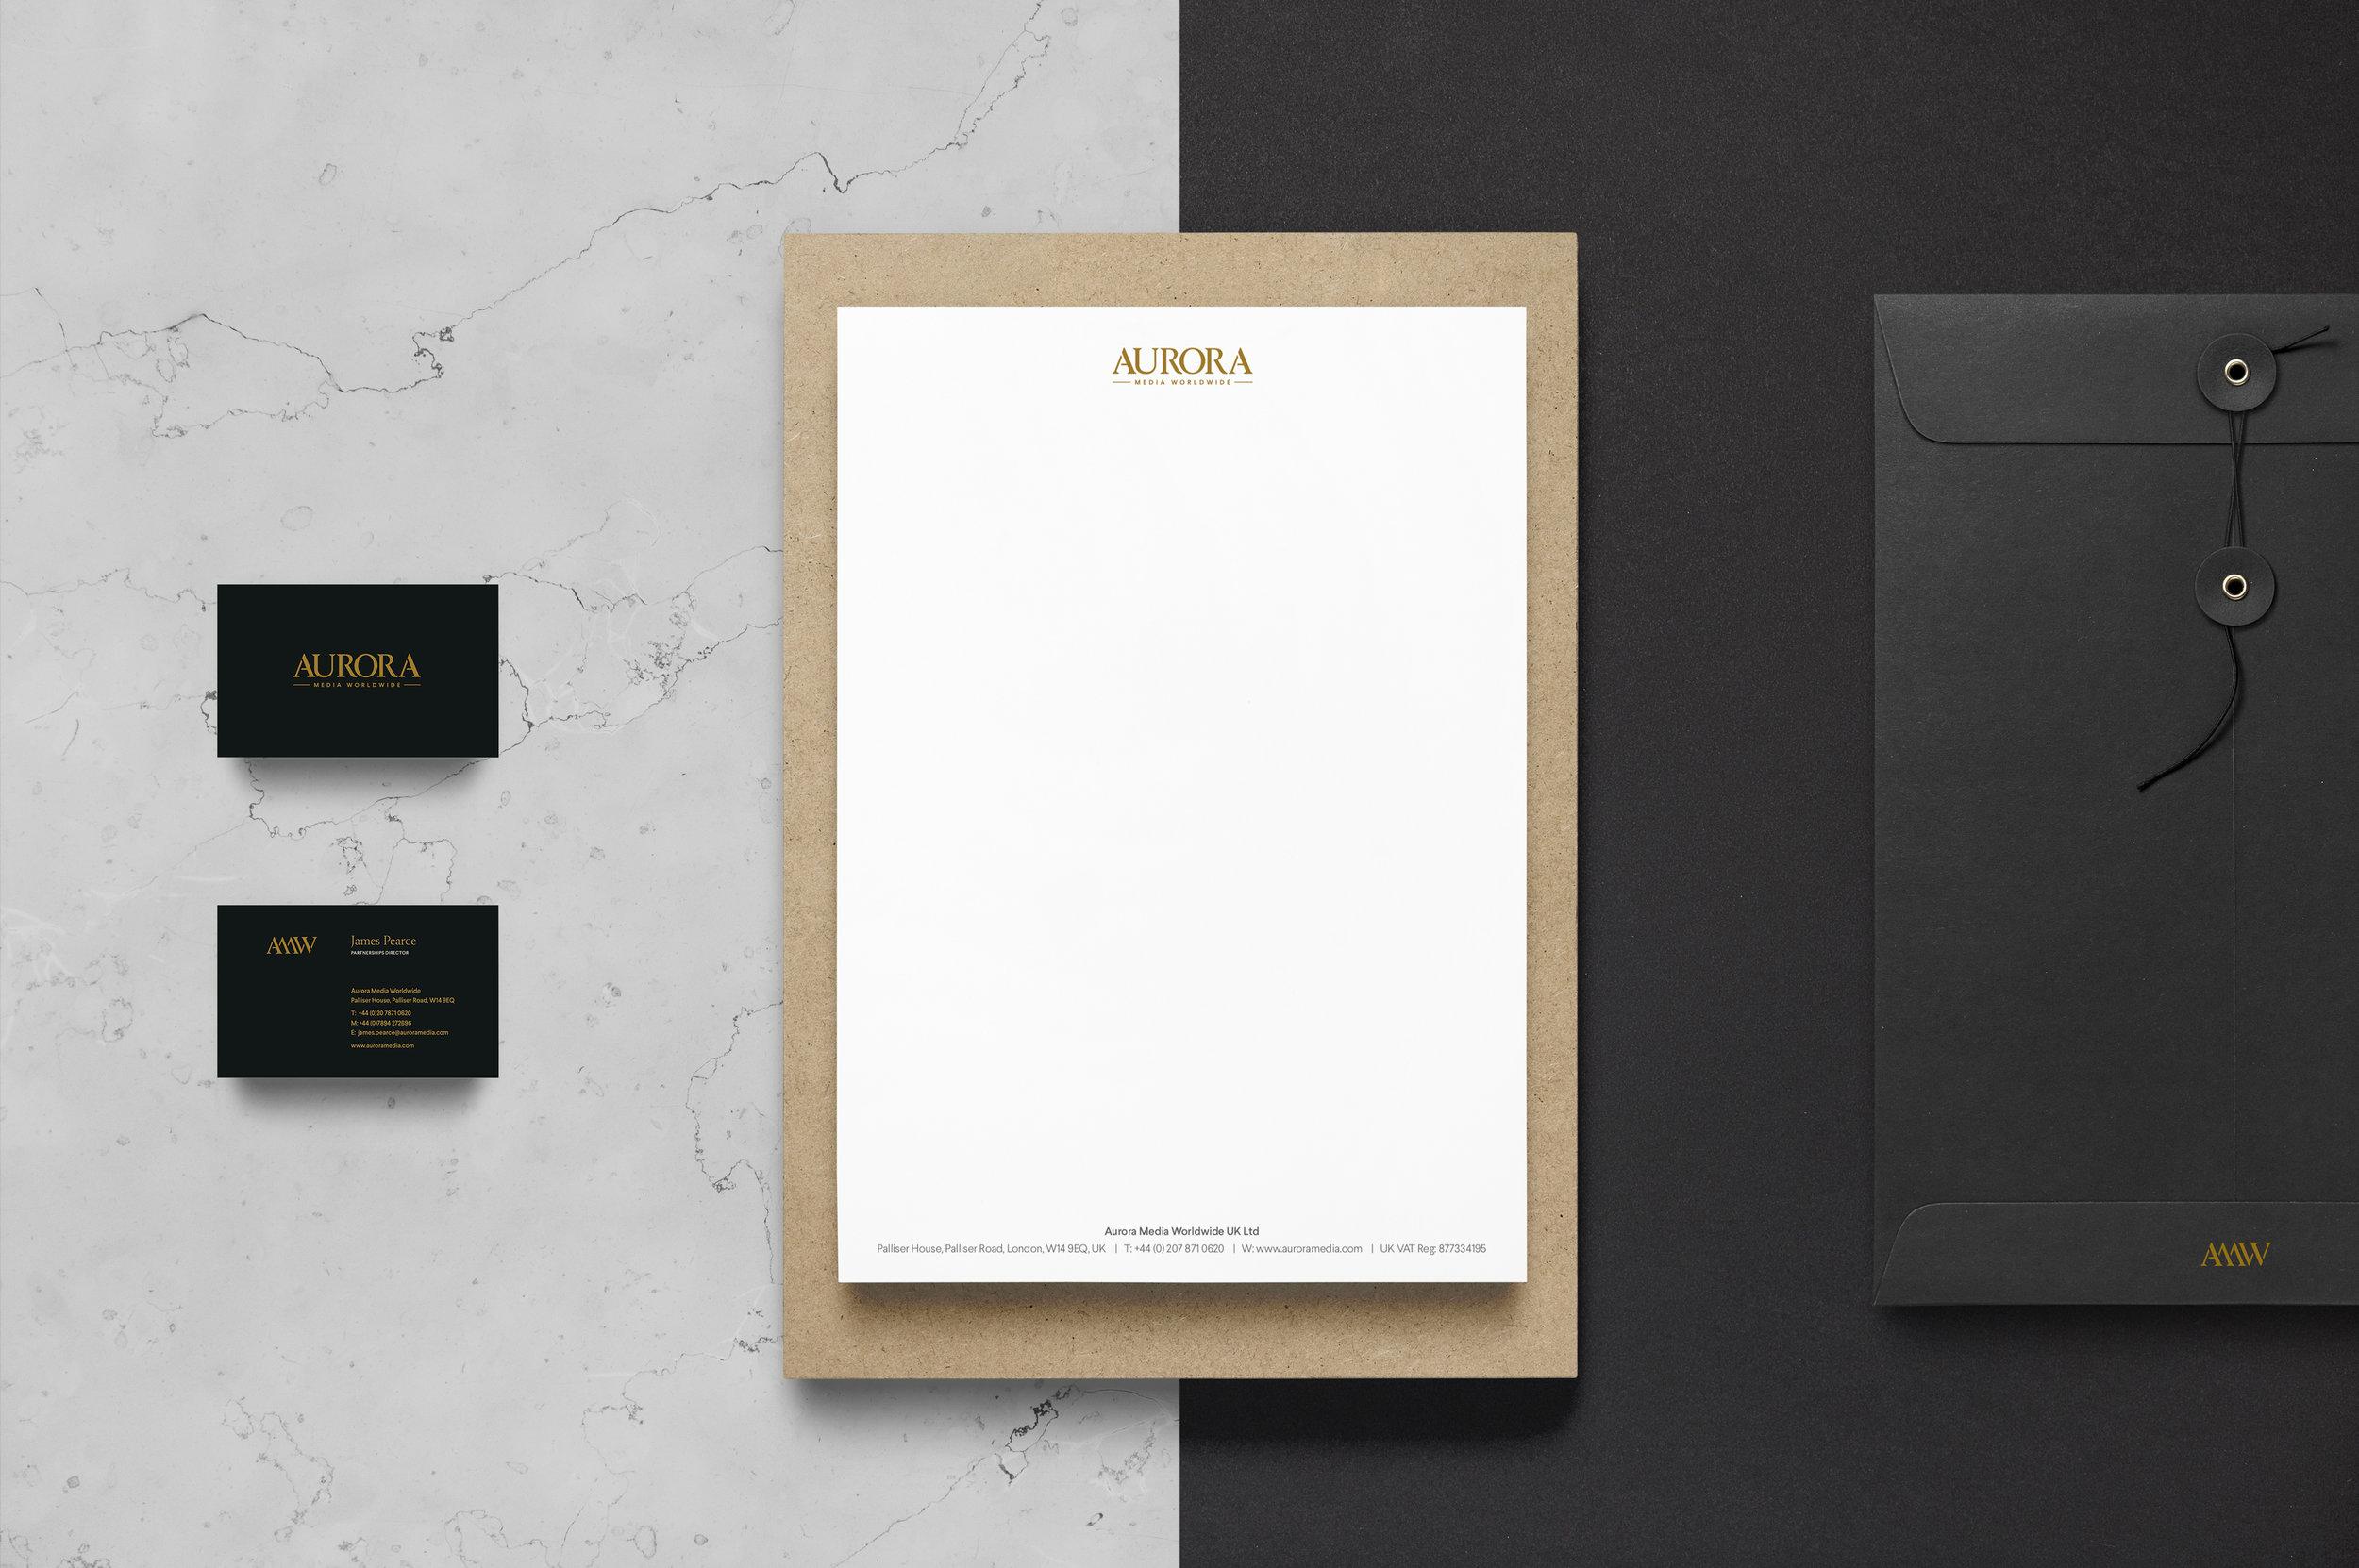 Aurora-Branding-Identity-MockUp-Vol16.jpg